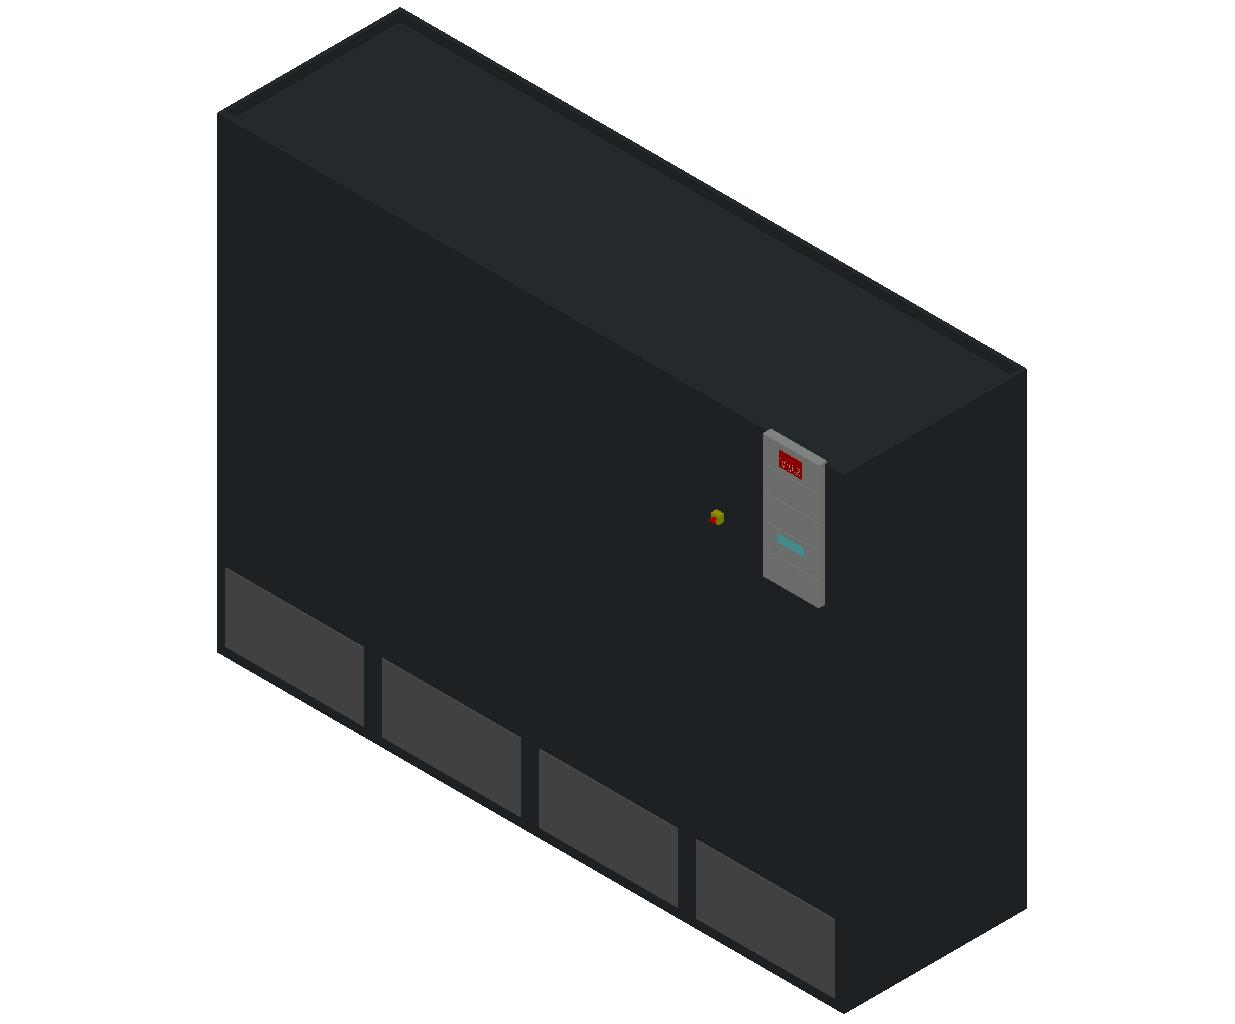 HC_Air Conditioner_Indoor Unit_MEPcontent_STULZ_CyberAir 3PRO_ASR_CW_ASR_2410_CW_INT-EN.dwg